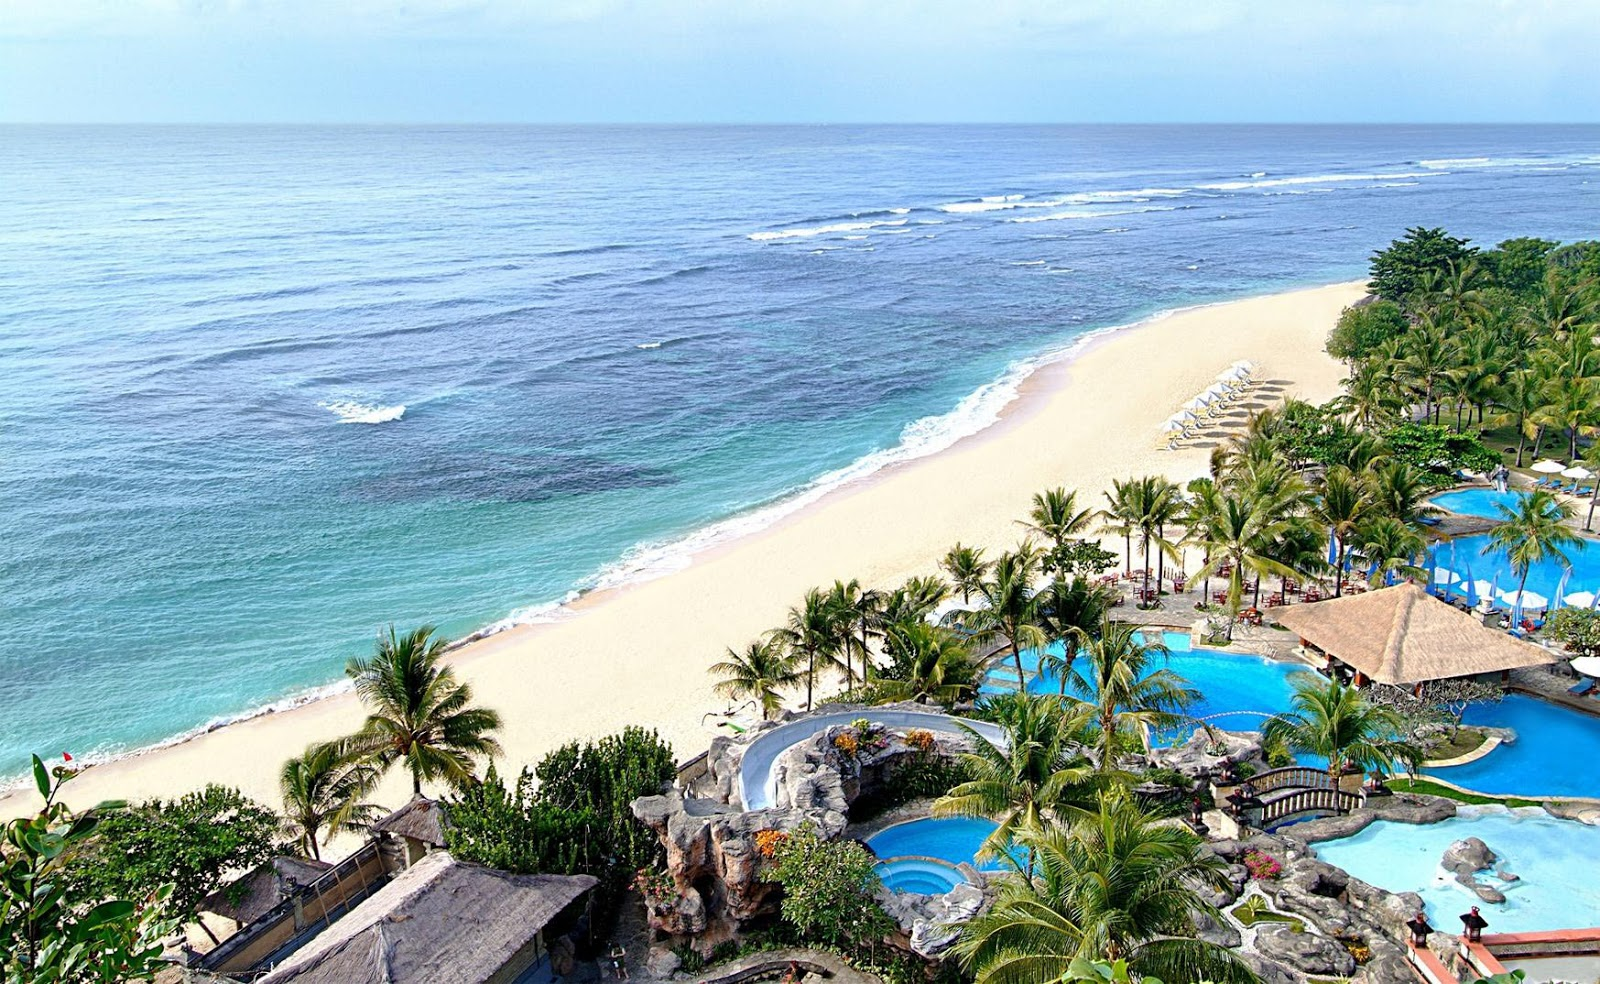 Bali Indonesia Tourist Destination Tourism Company And Tourism Information Center